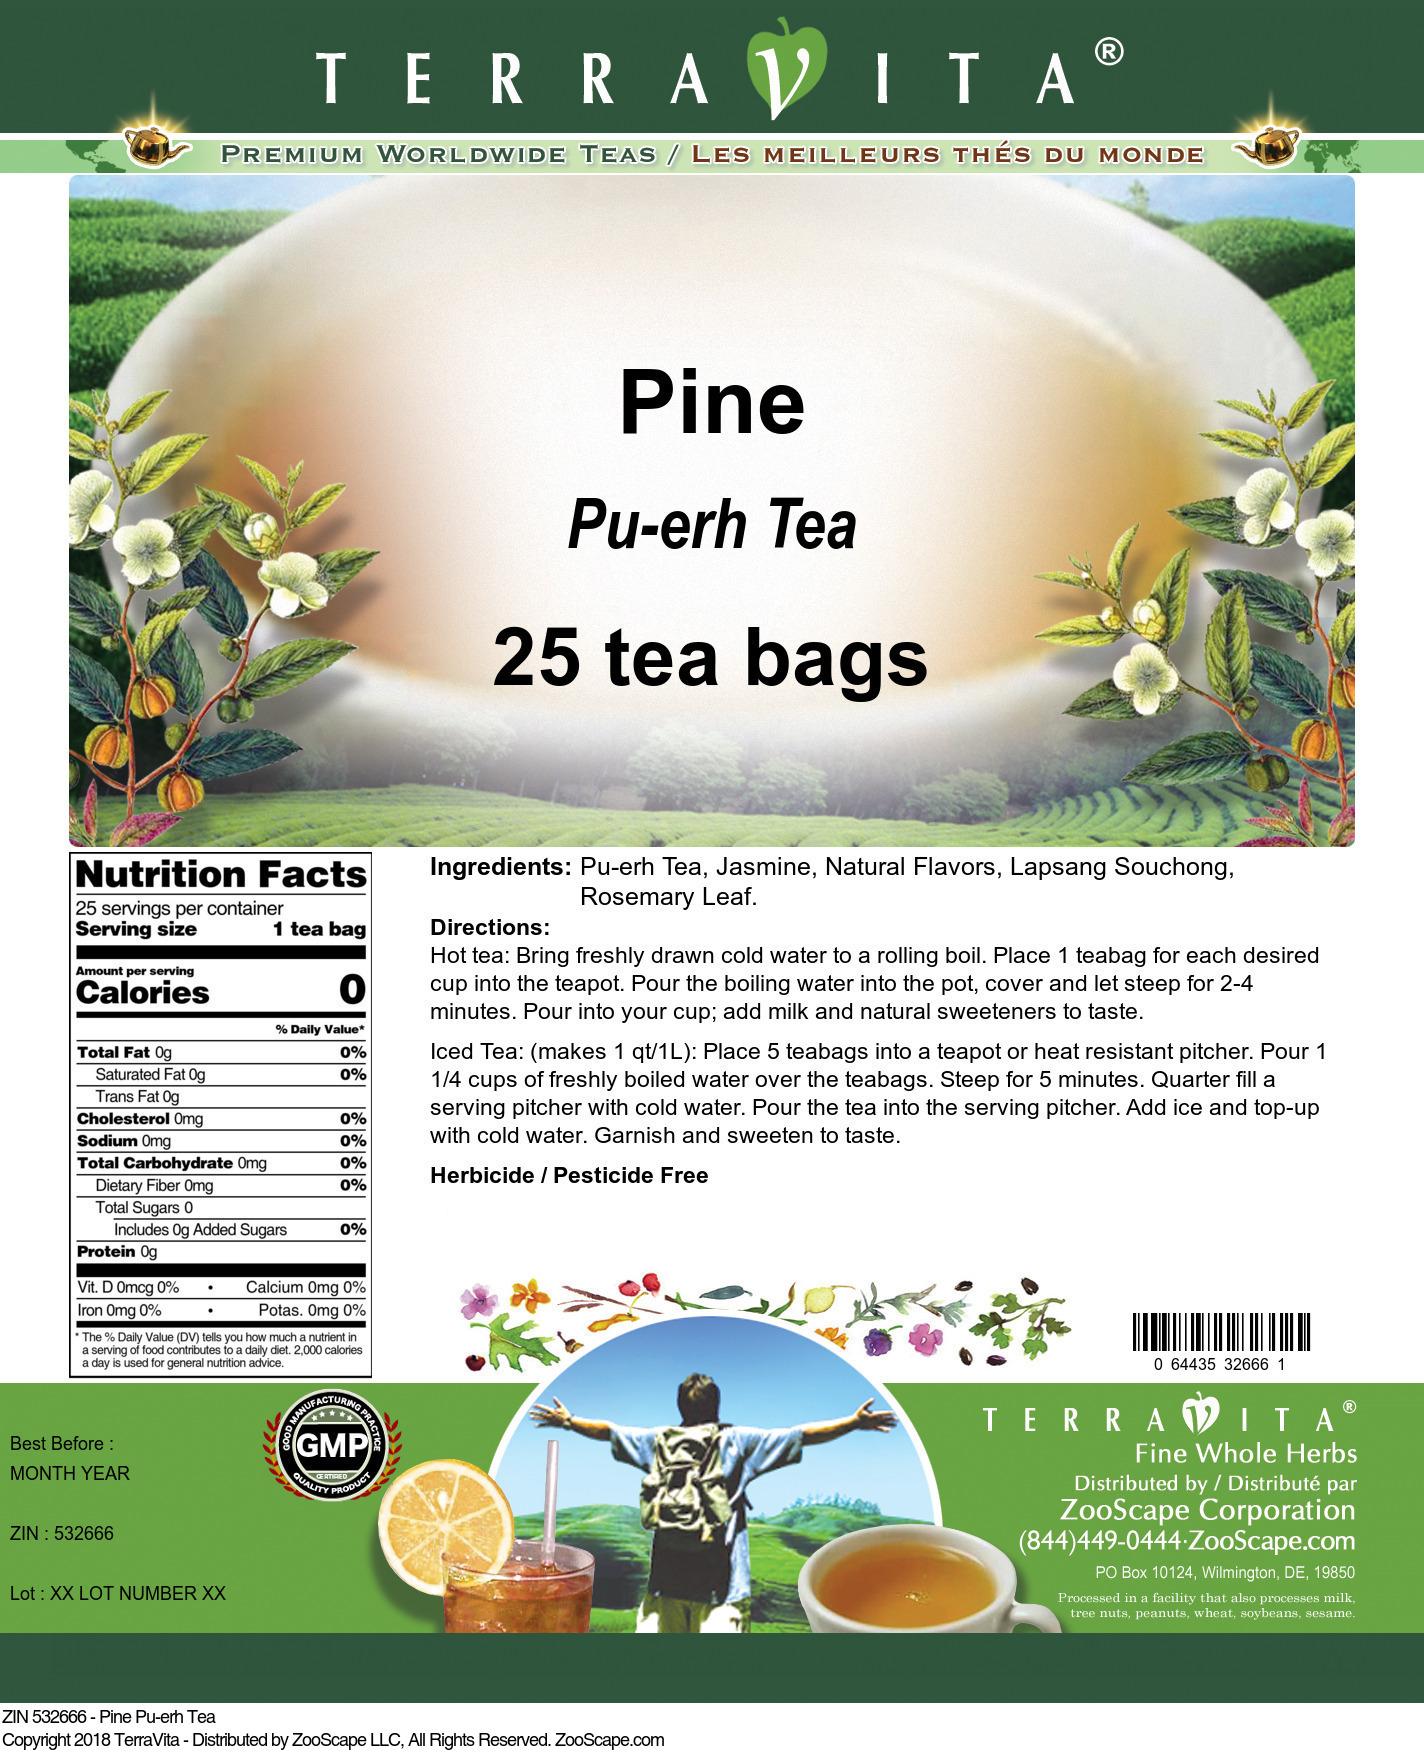 Pine Pu-erh Tea